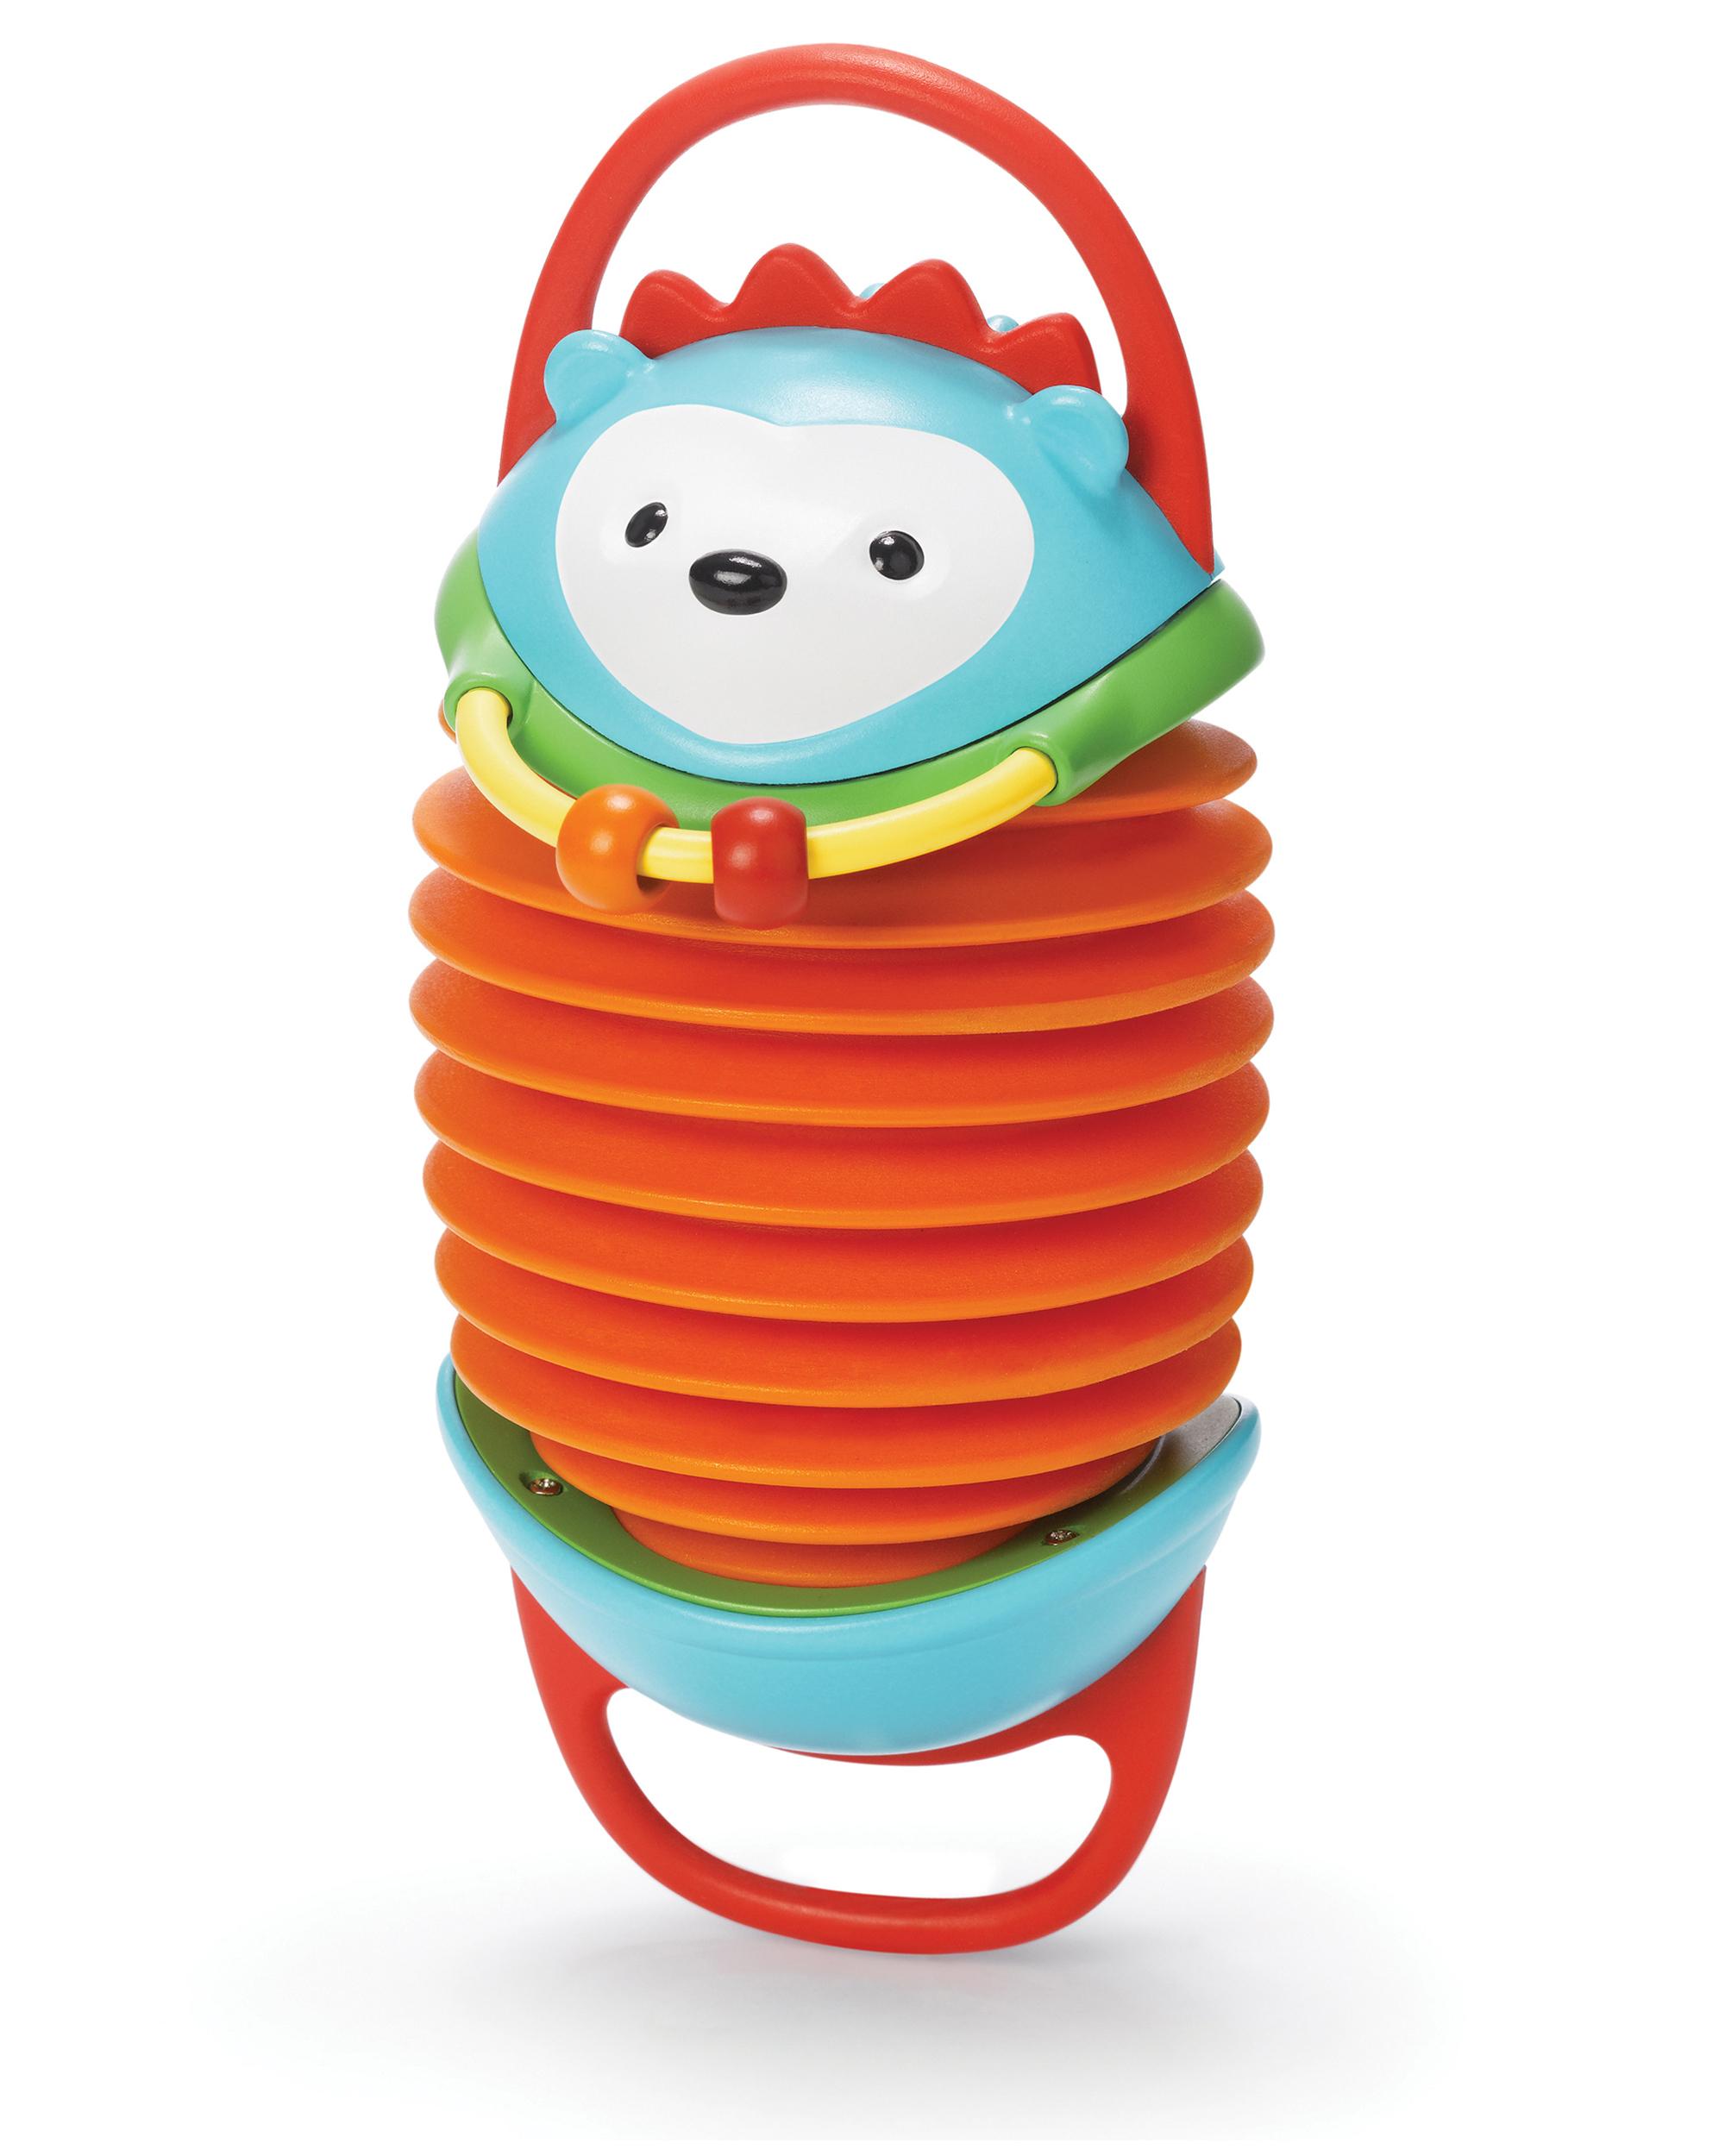 Oshkoshbgosh Explore & More Hedgehog Accordion Toy